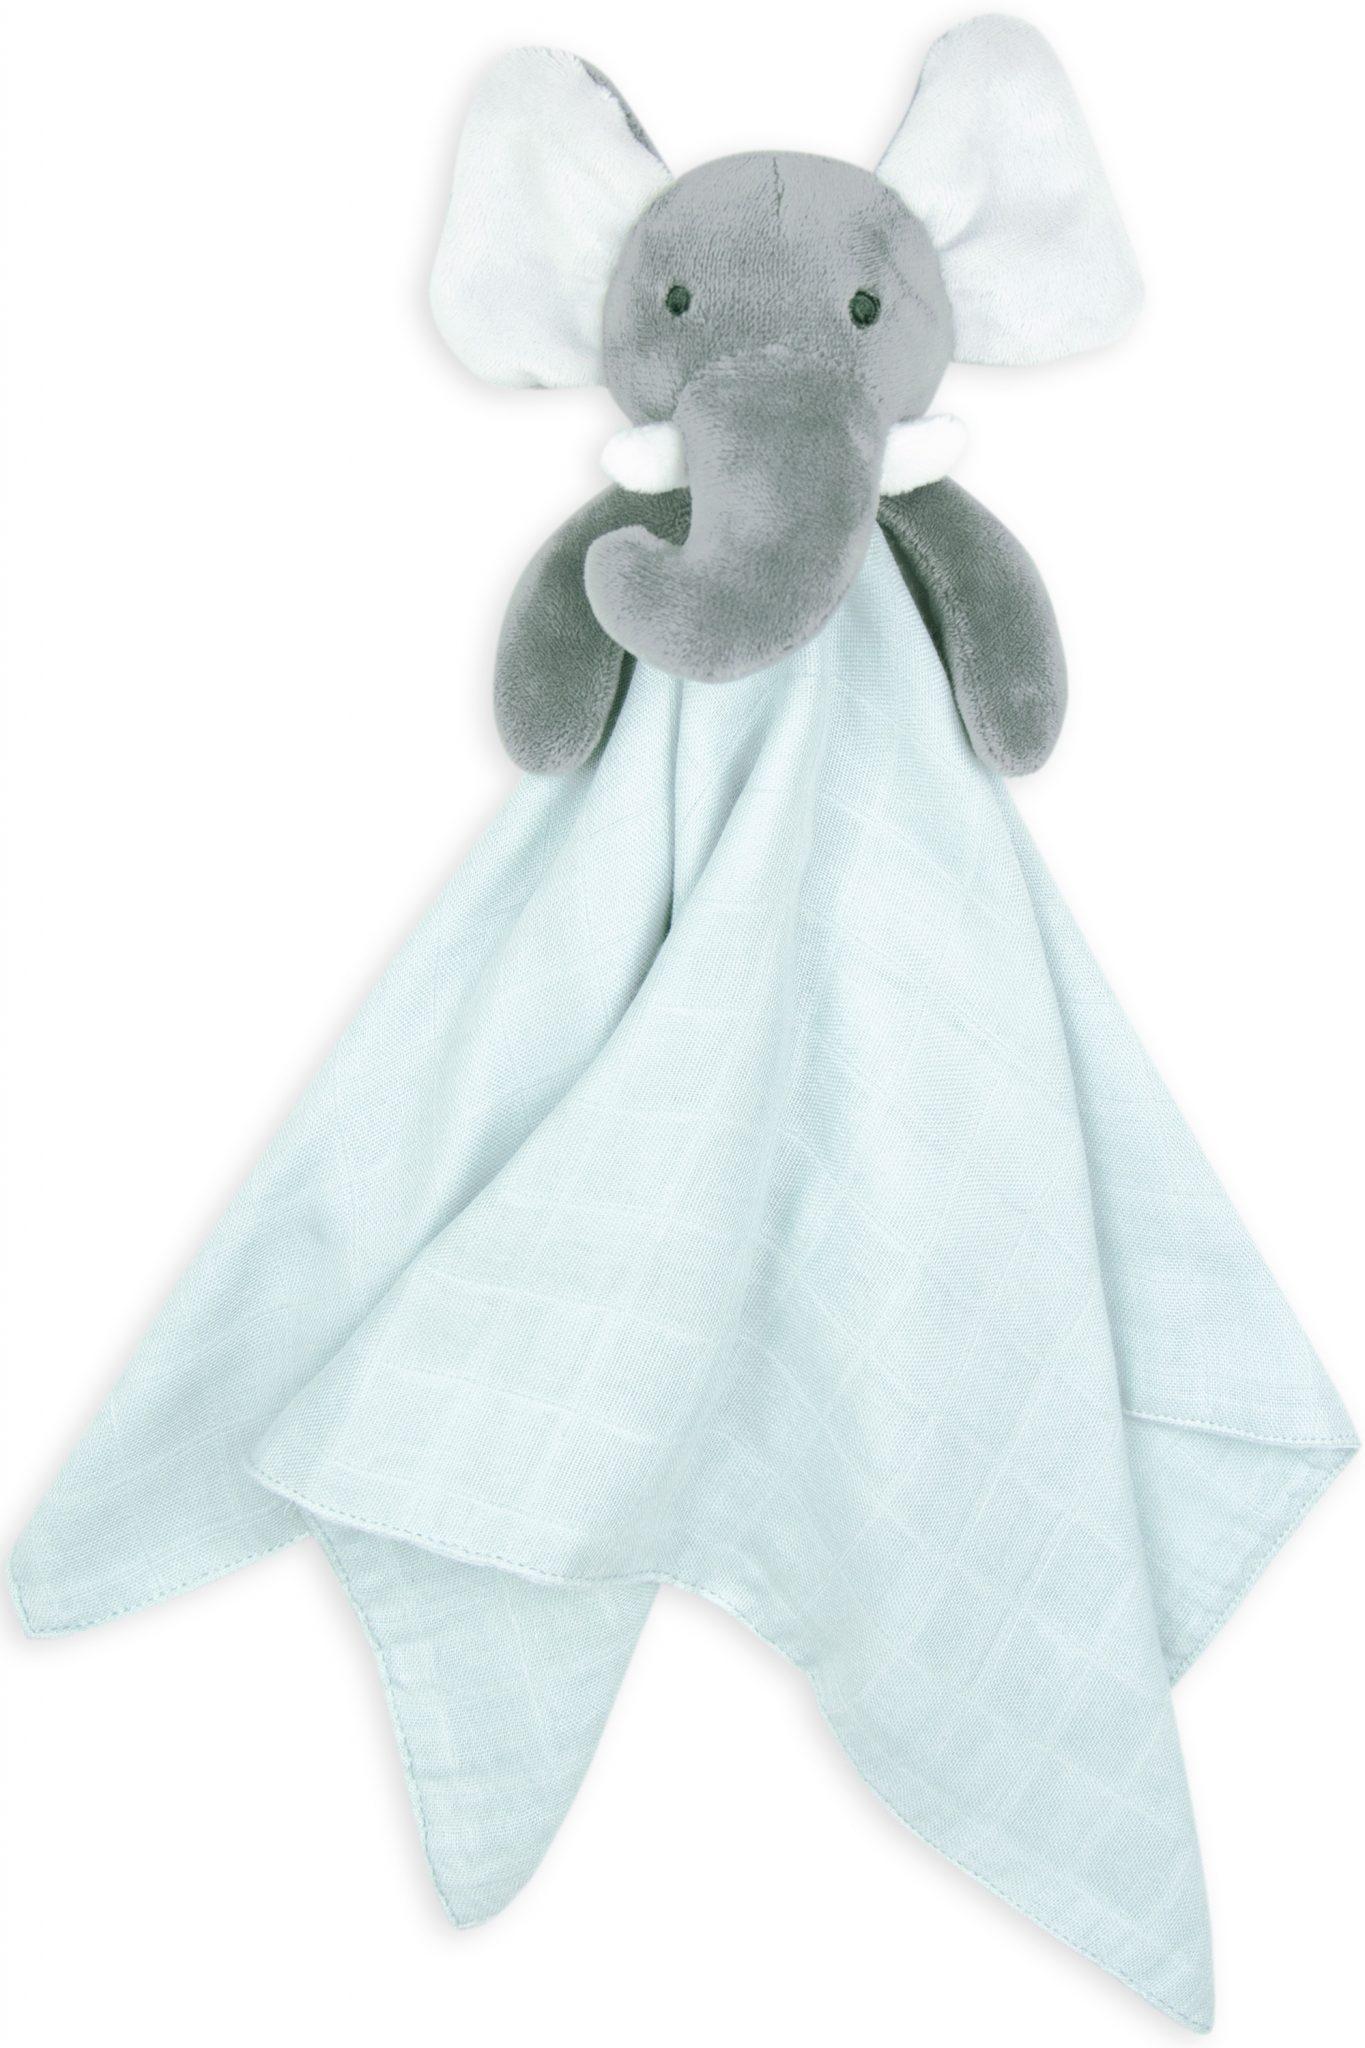 Elephant Comforter moonlight baby sleep bamboo swaddle mint colour